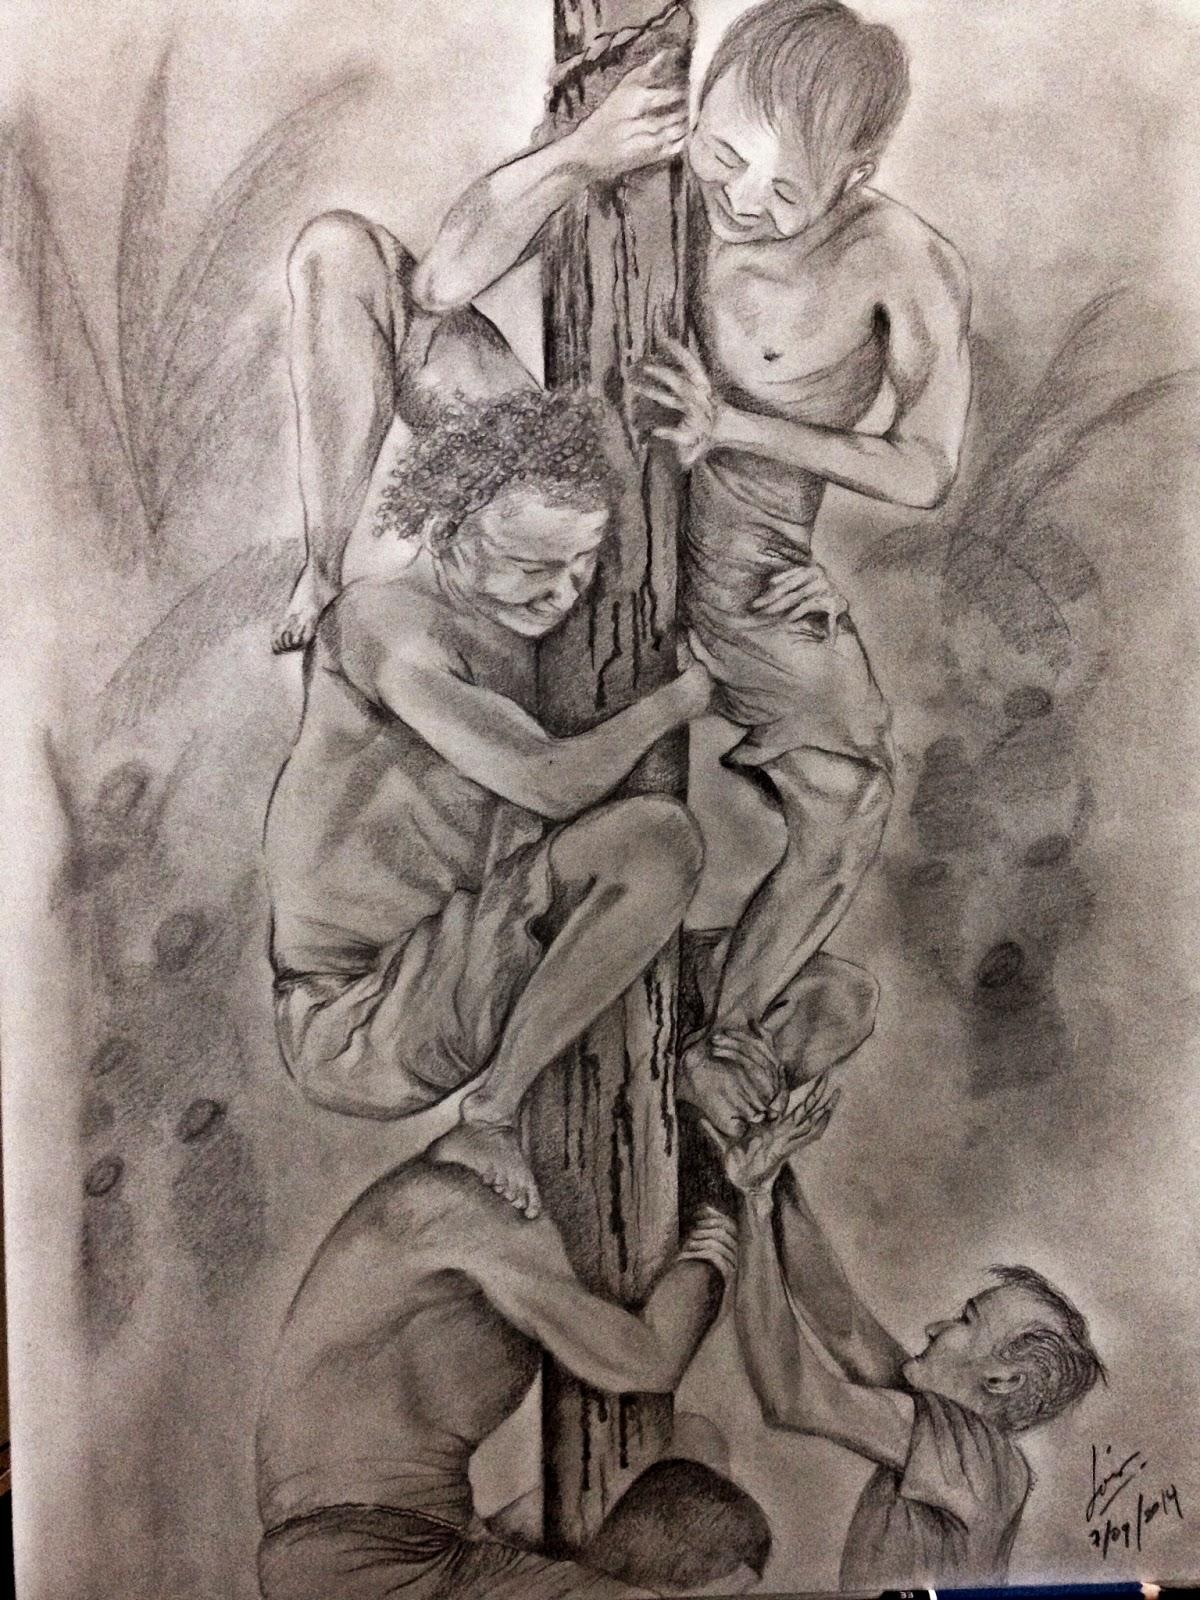 Kumpulan Sketsa Gambar Lomba Panjat Pinang